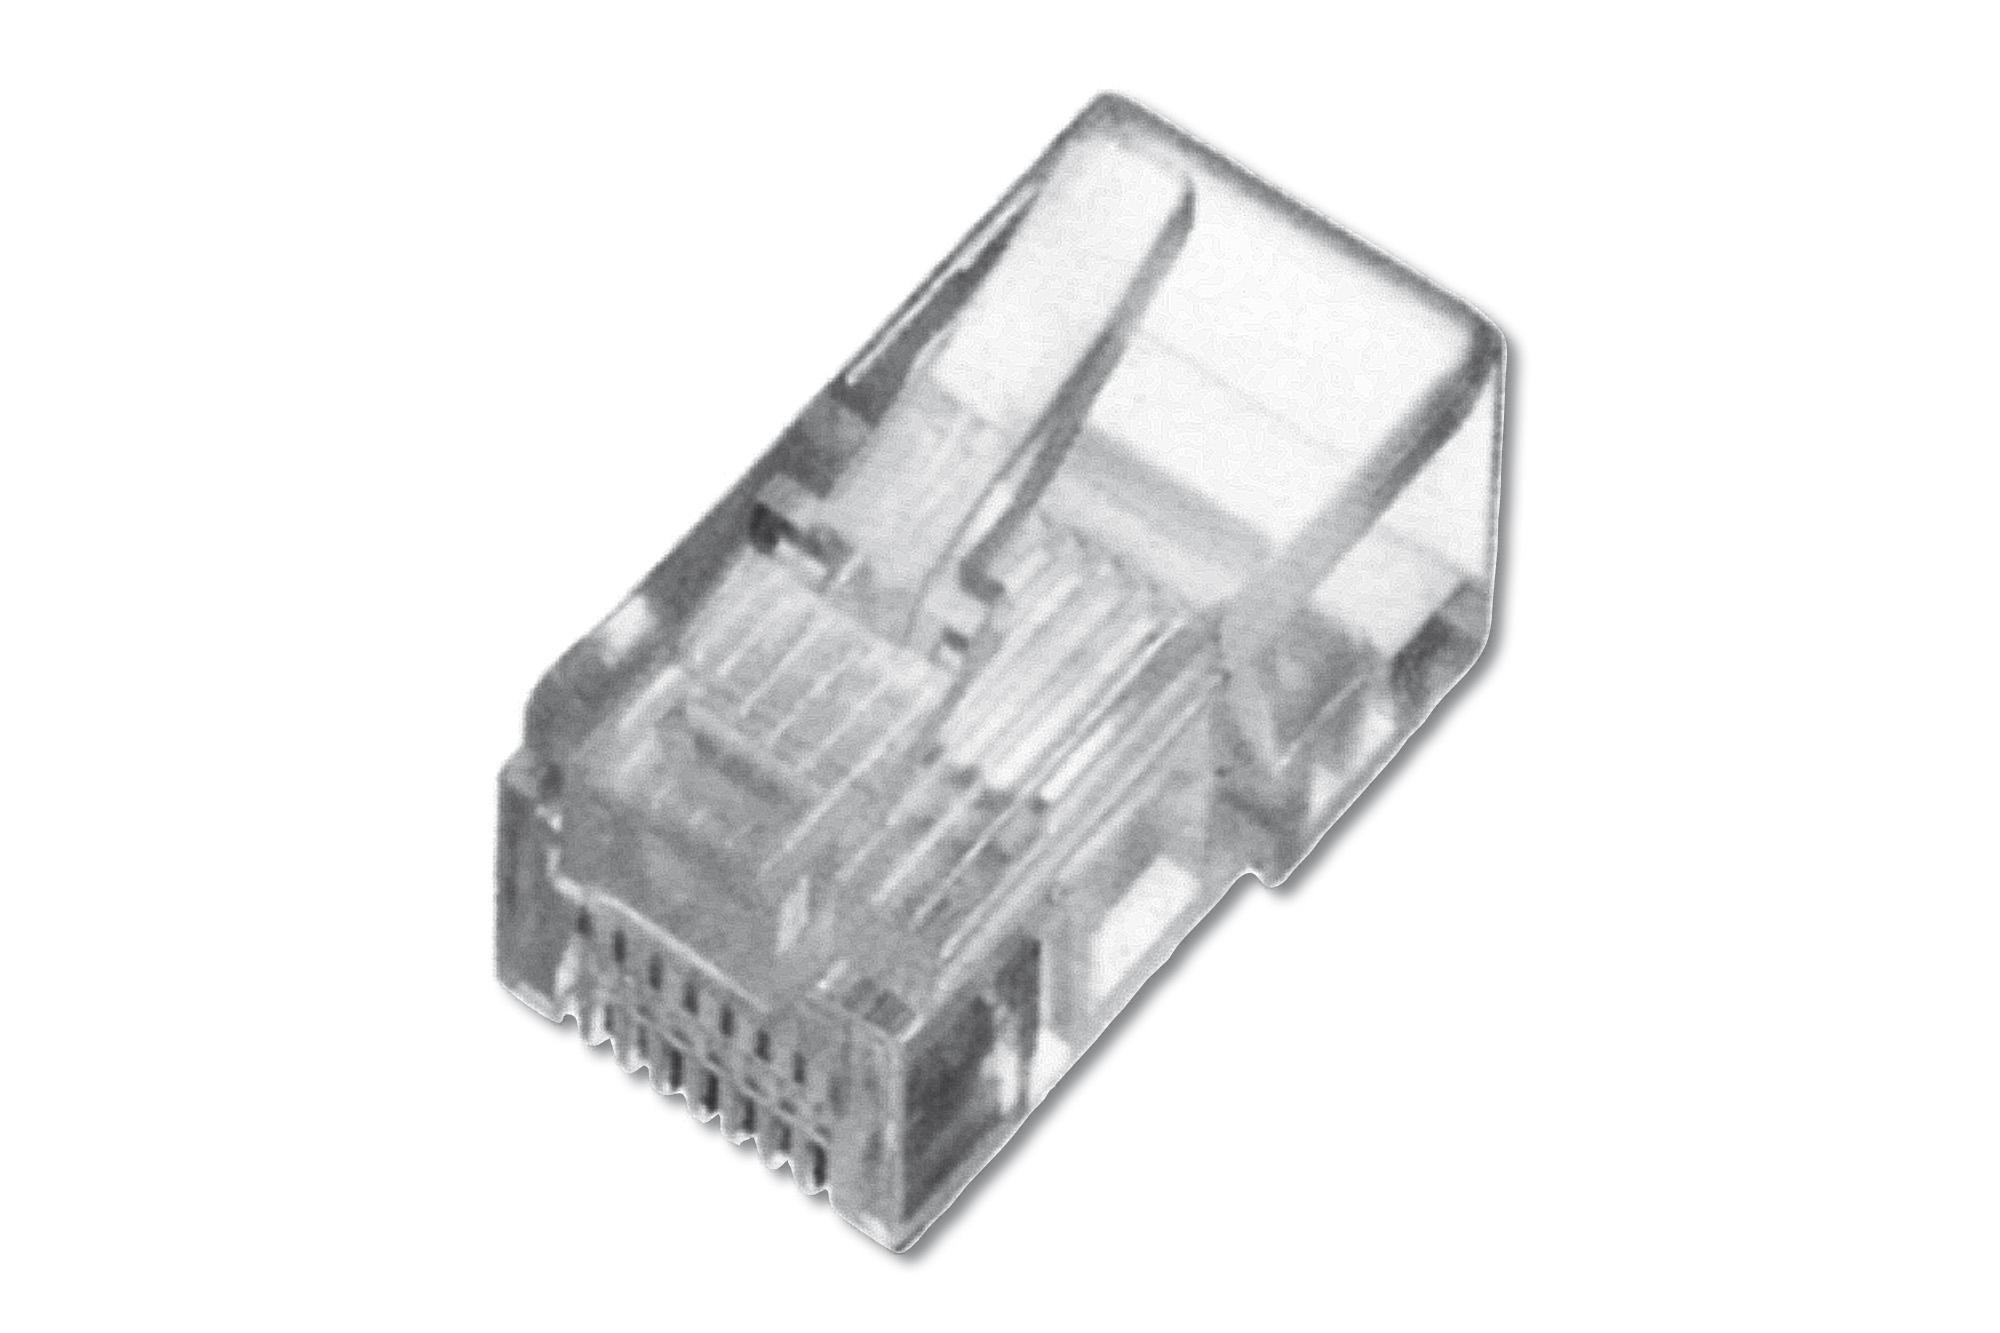 ASSMANN Electronic A-MO 6/4 SF wire connector RJ-14 6P4C